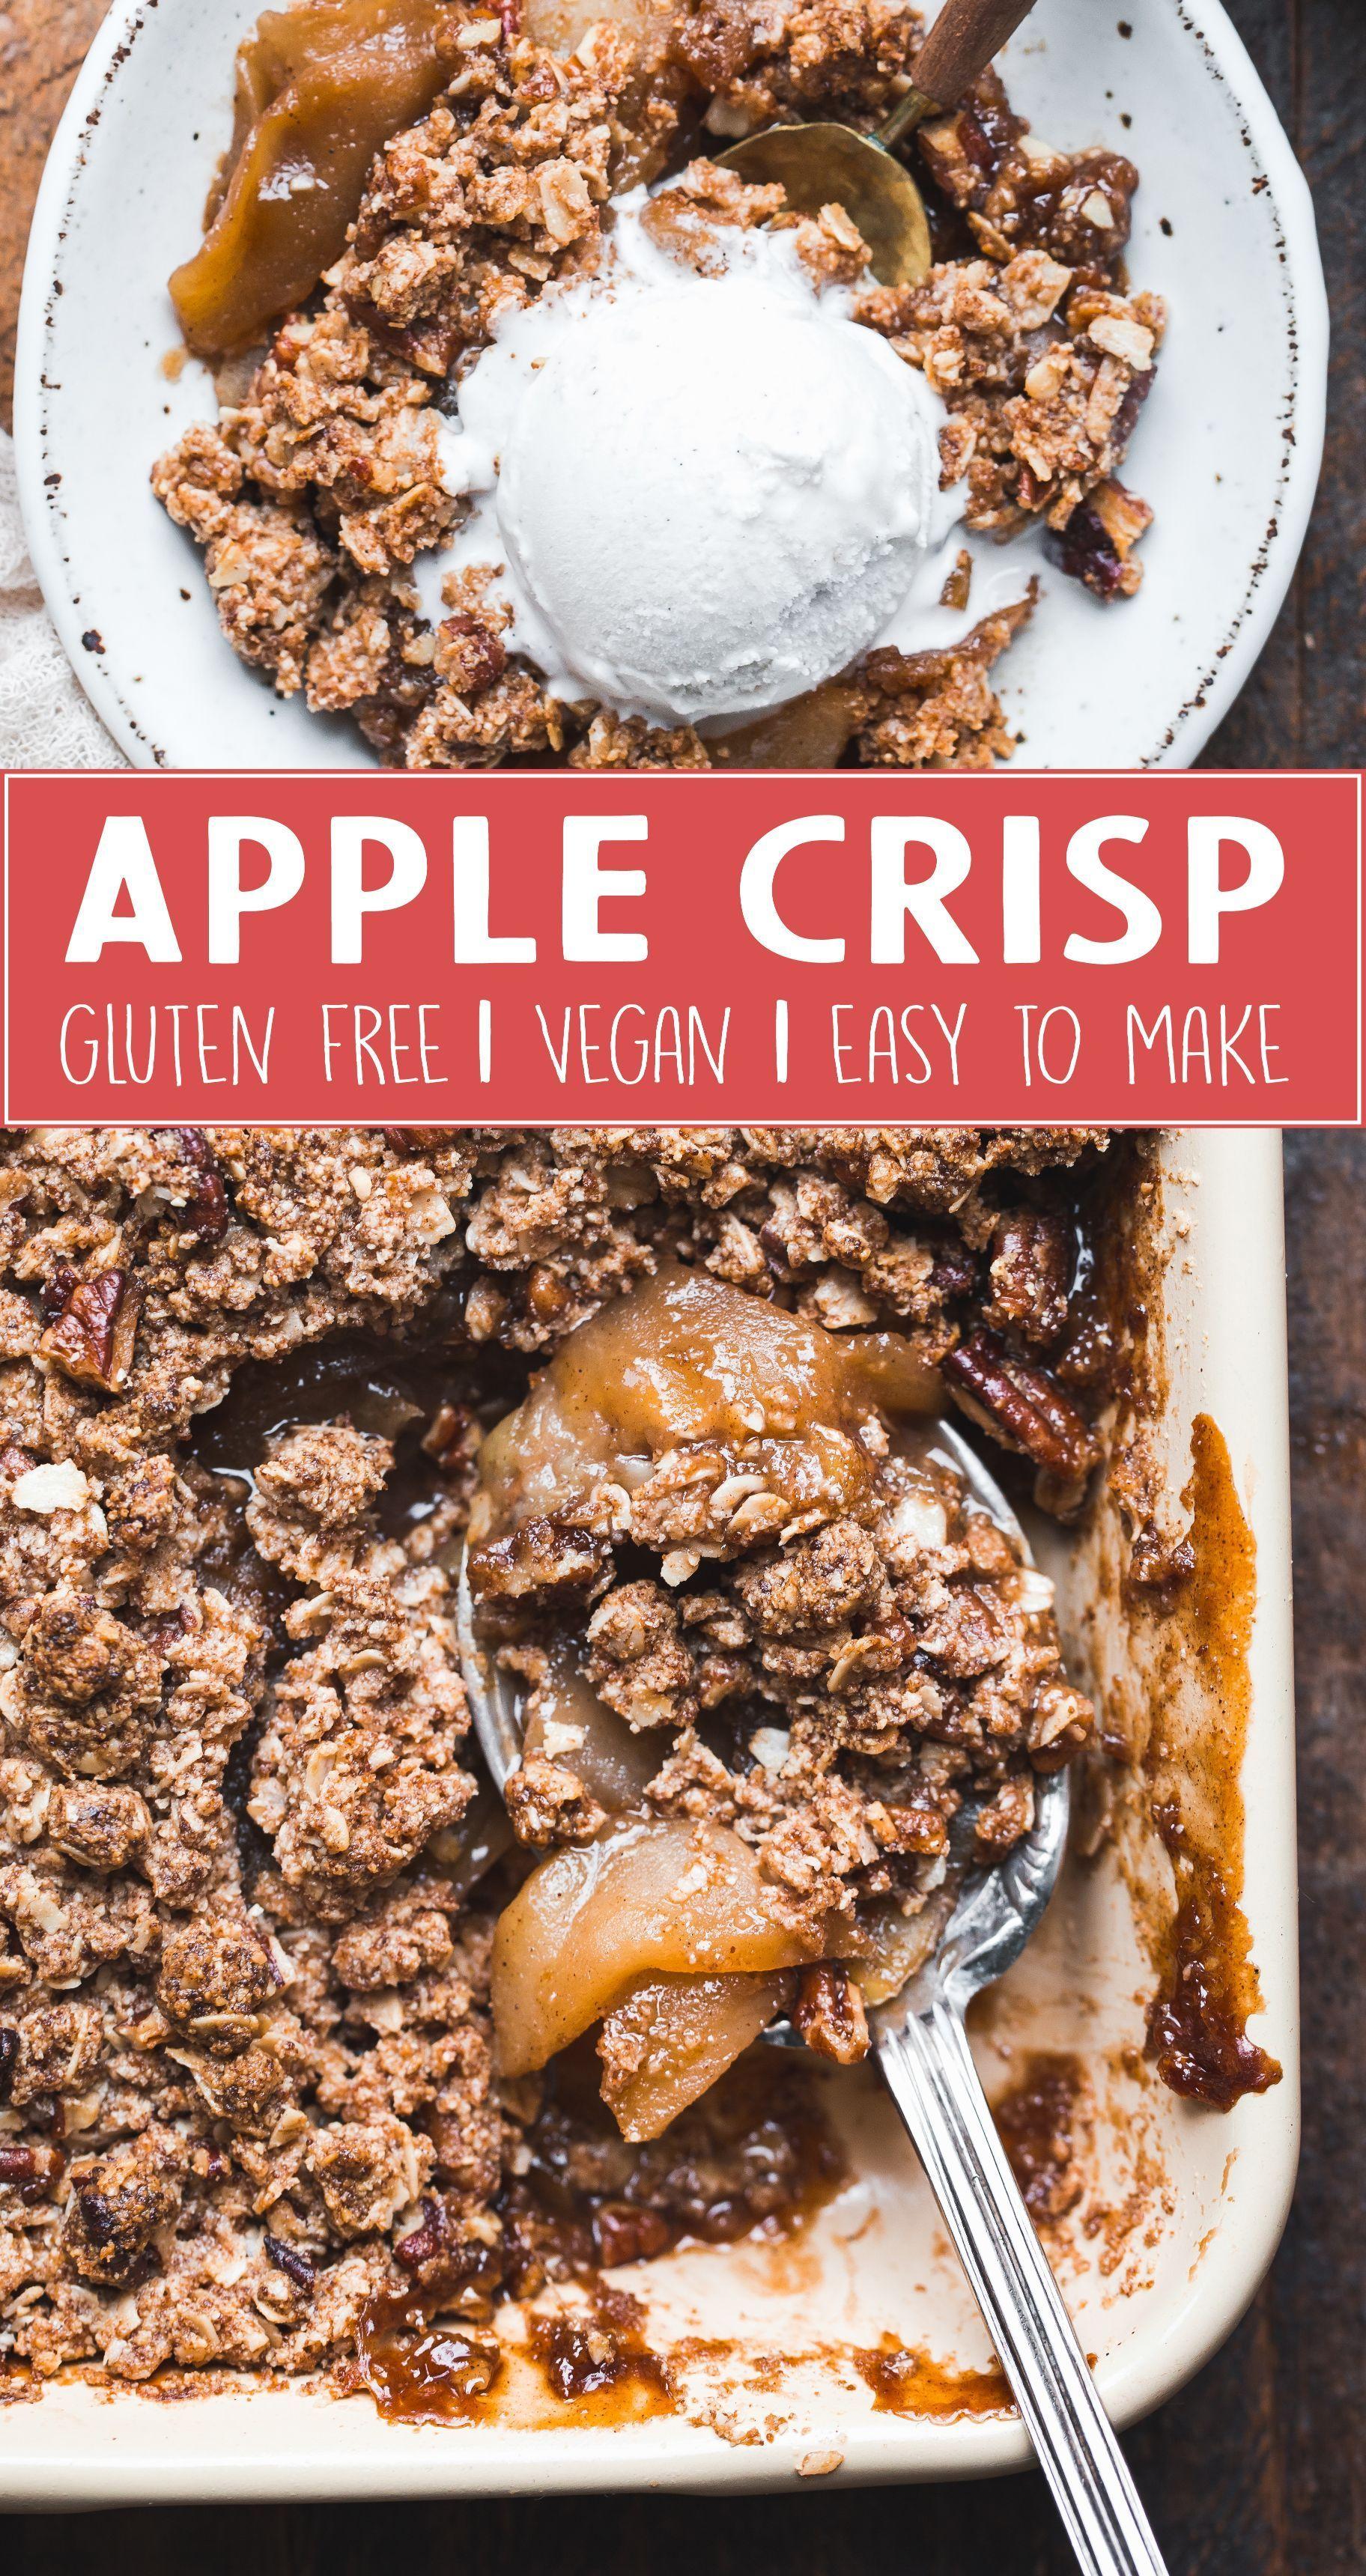 Gluten Free Vegan Apple Crisp Bakerita Recipe Vegan Apple Crisp Gluten Free Apple Crisp Apple Crisp